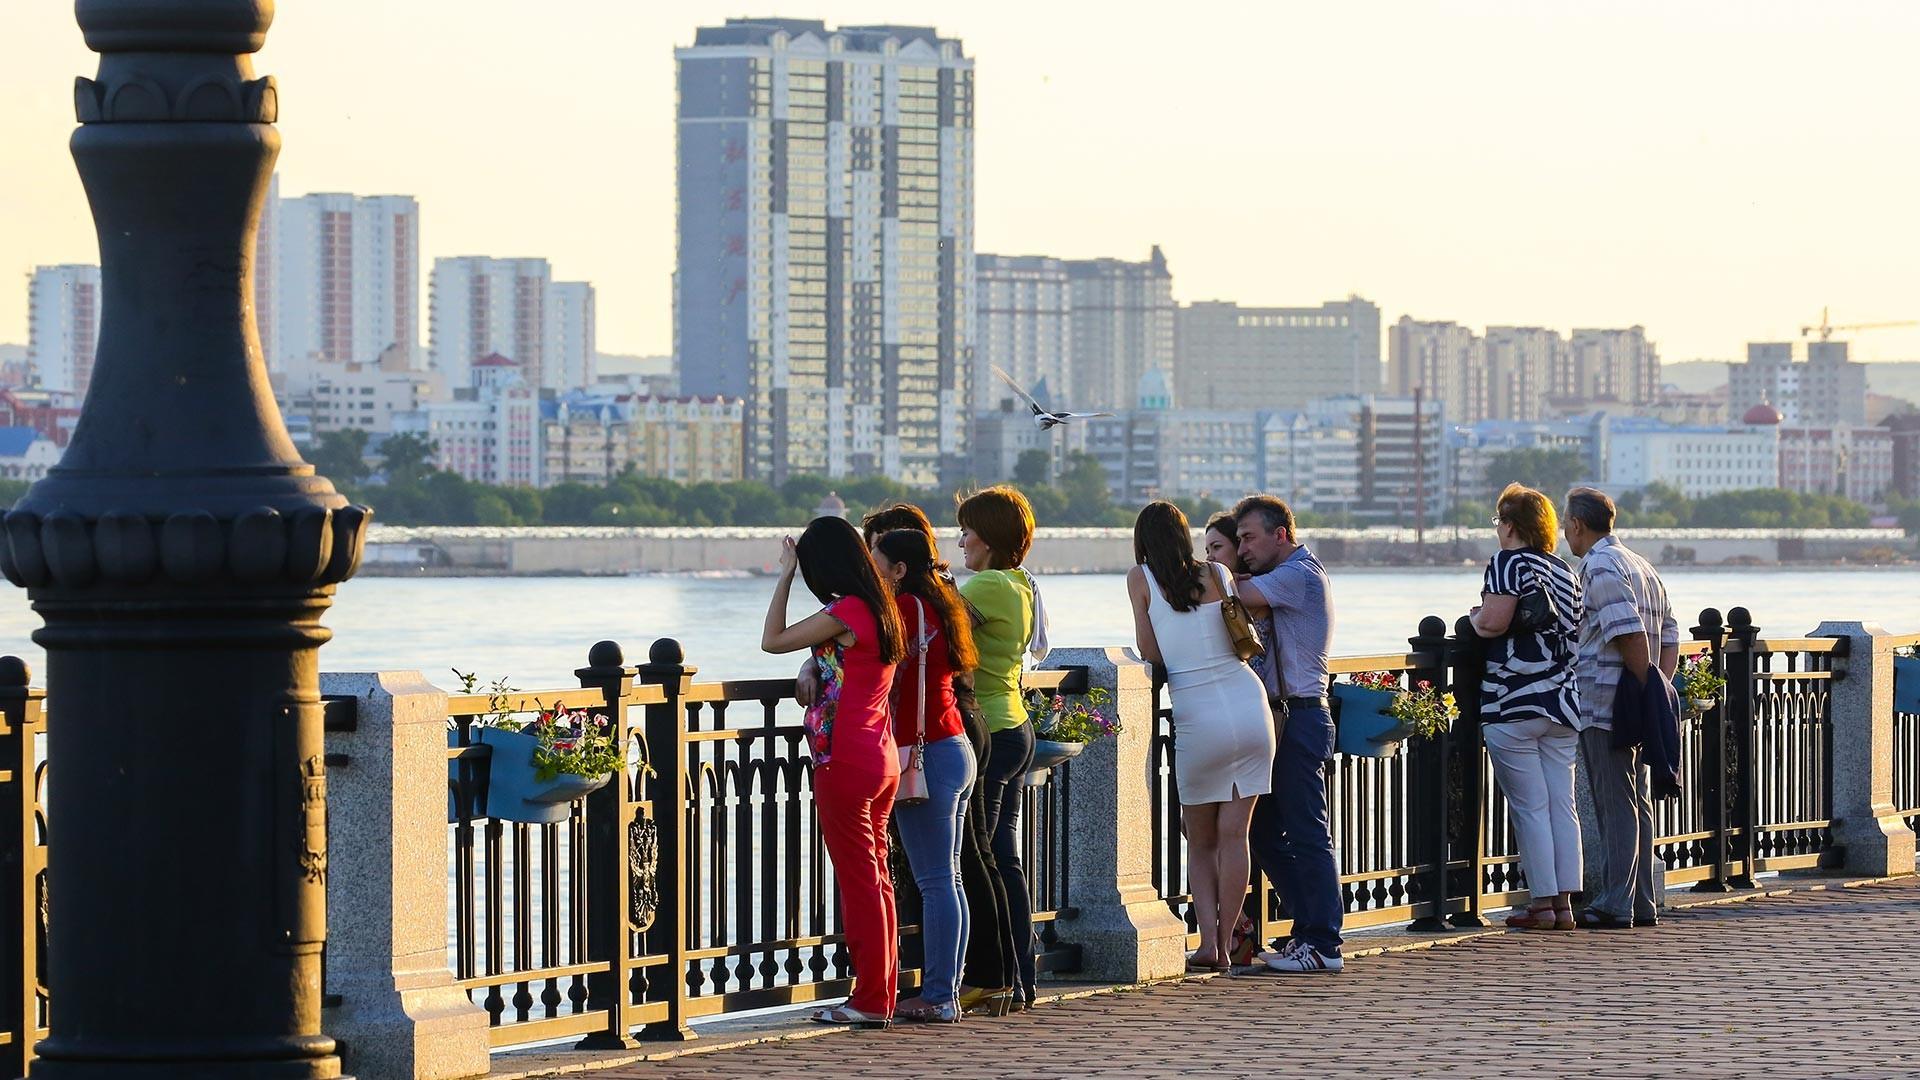 Благовештенск. Поглед на обалу реке Амур и град Хејхе (Кина).